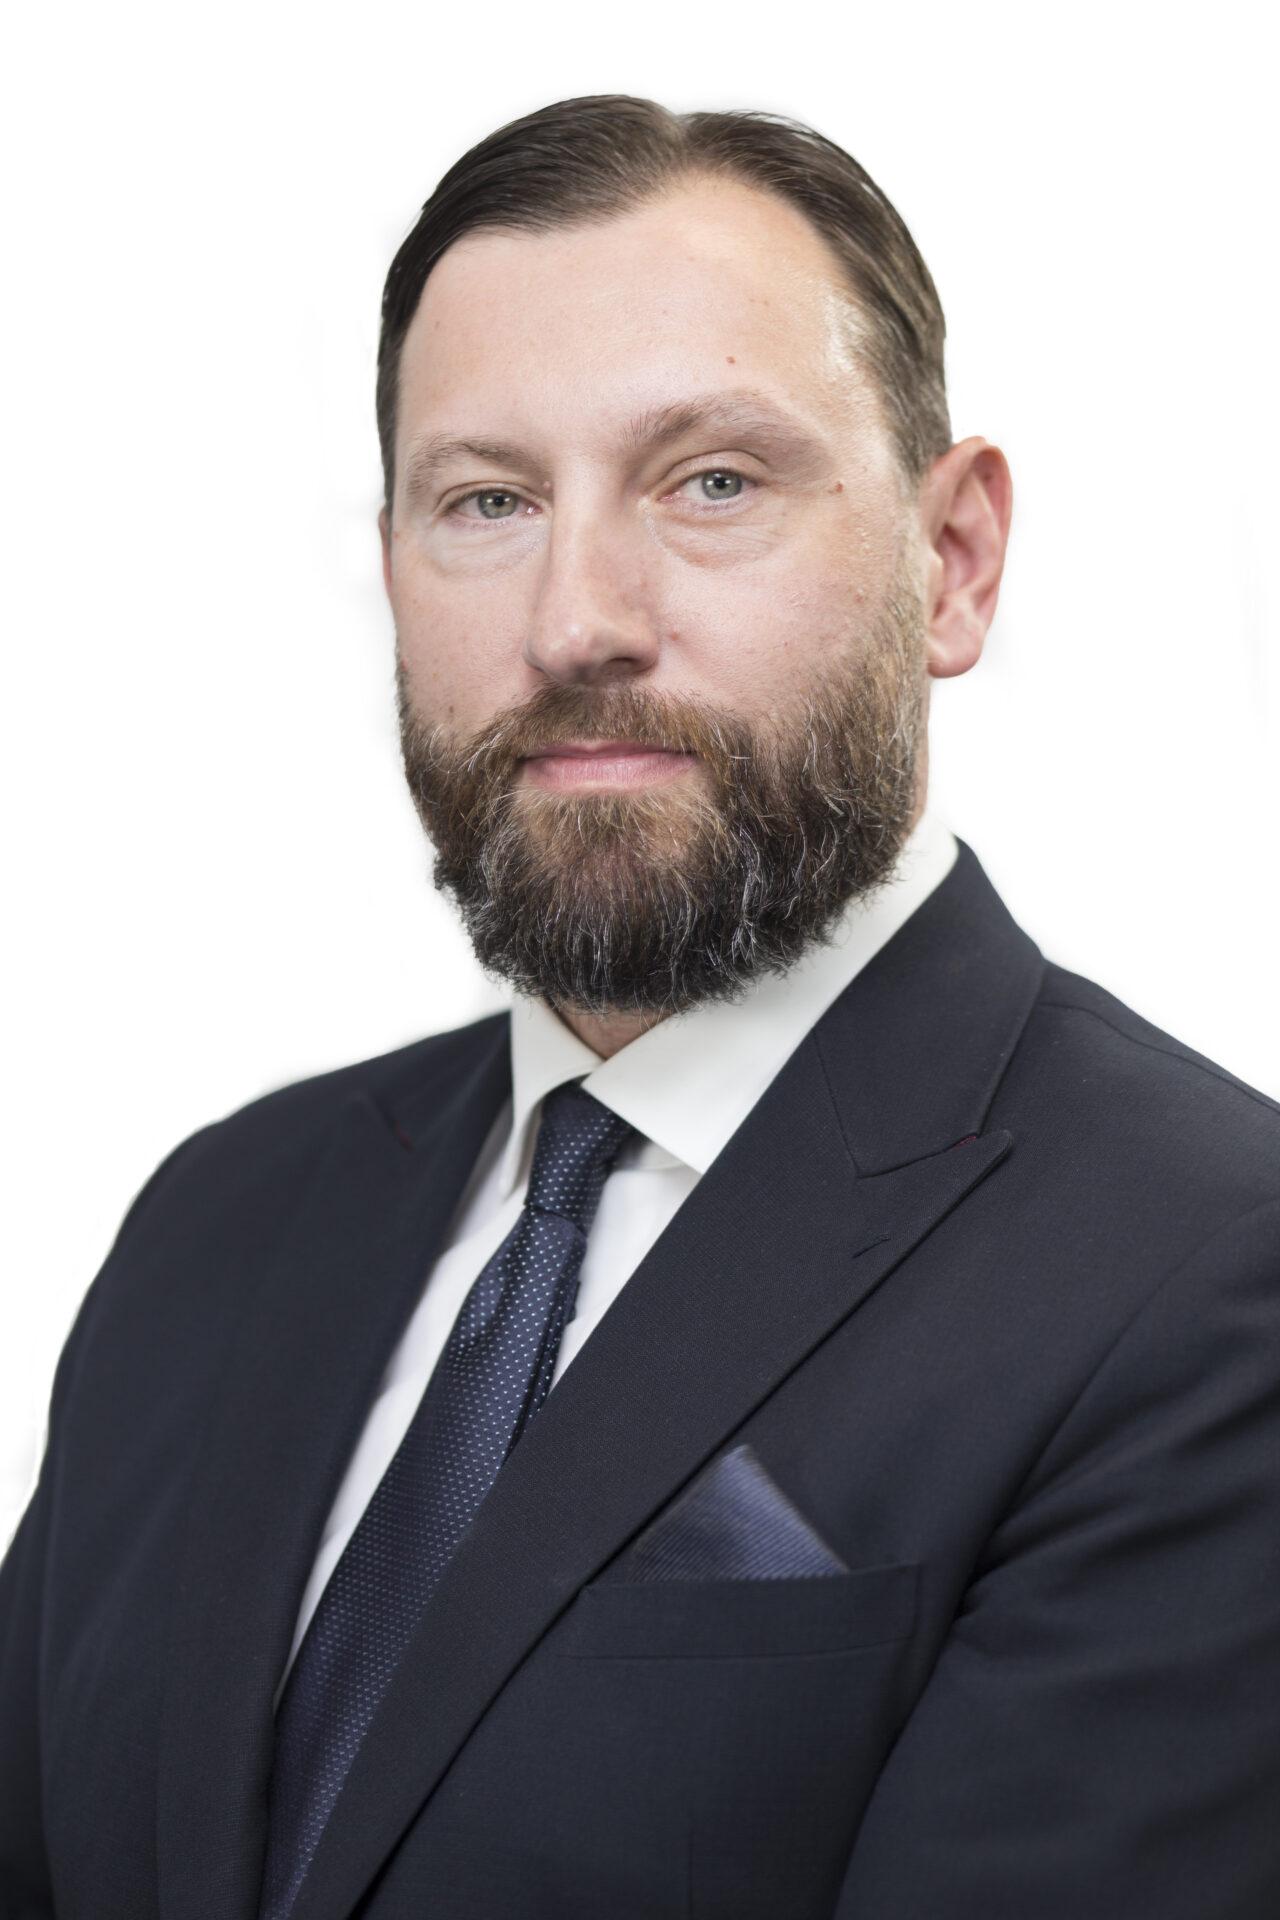 https://intelligent-investors.de/wp-content/uploads/2020/05/Marcin-Adamczyk_NN-IP-1280x1920.jpg